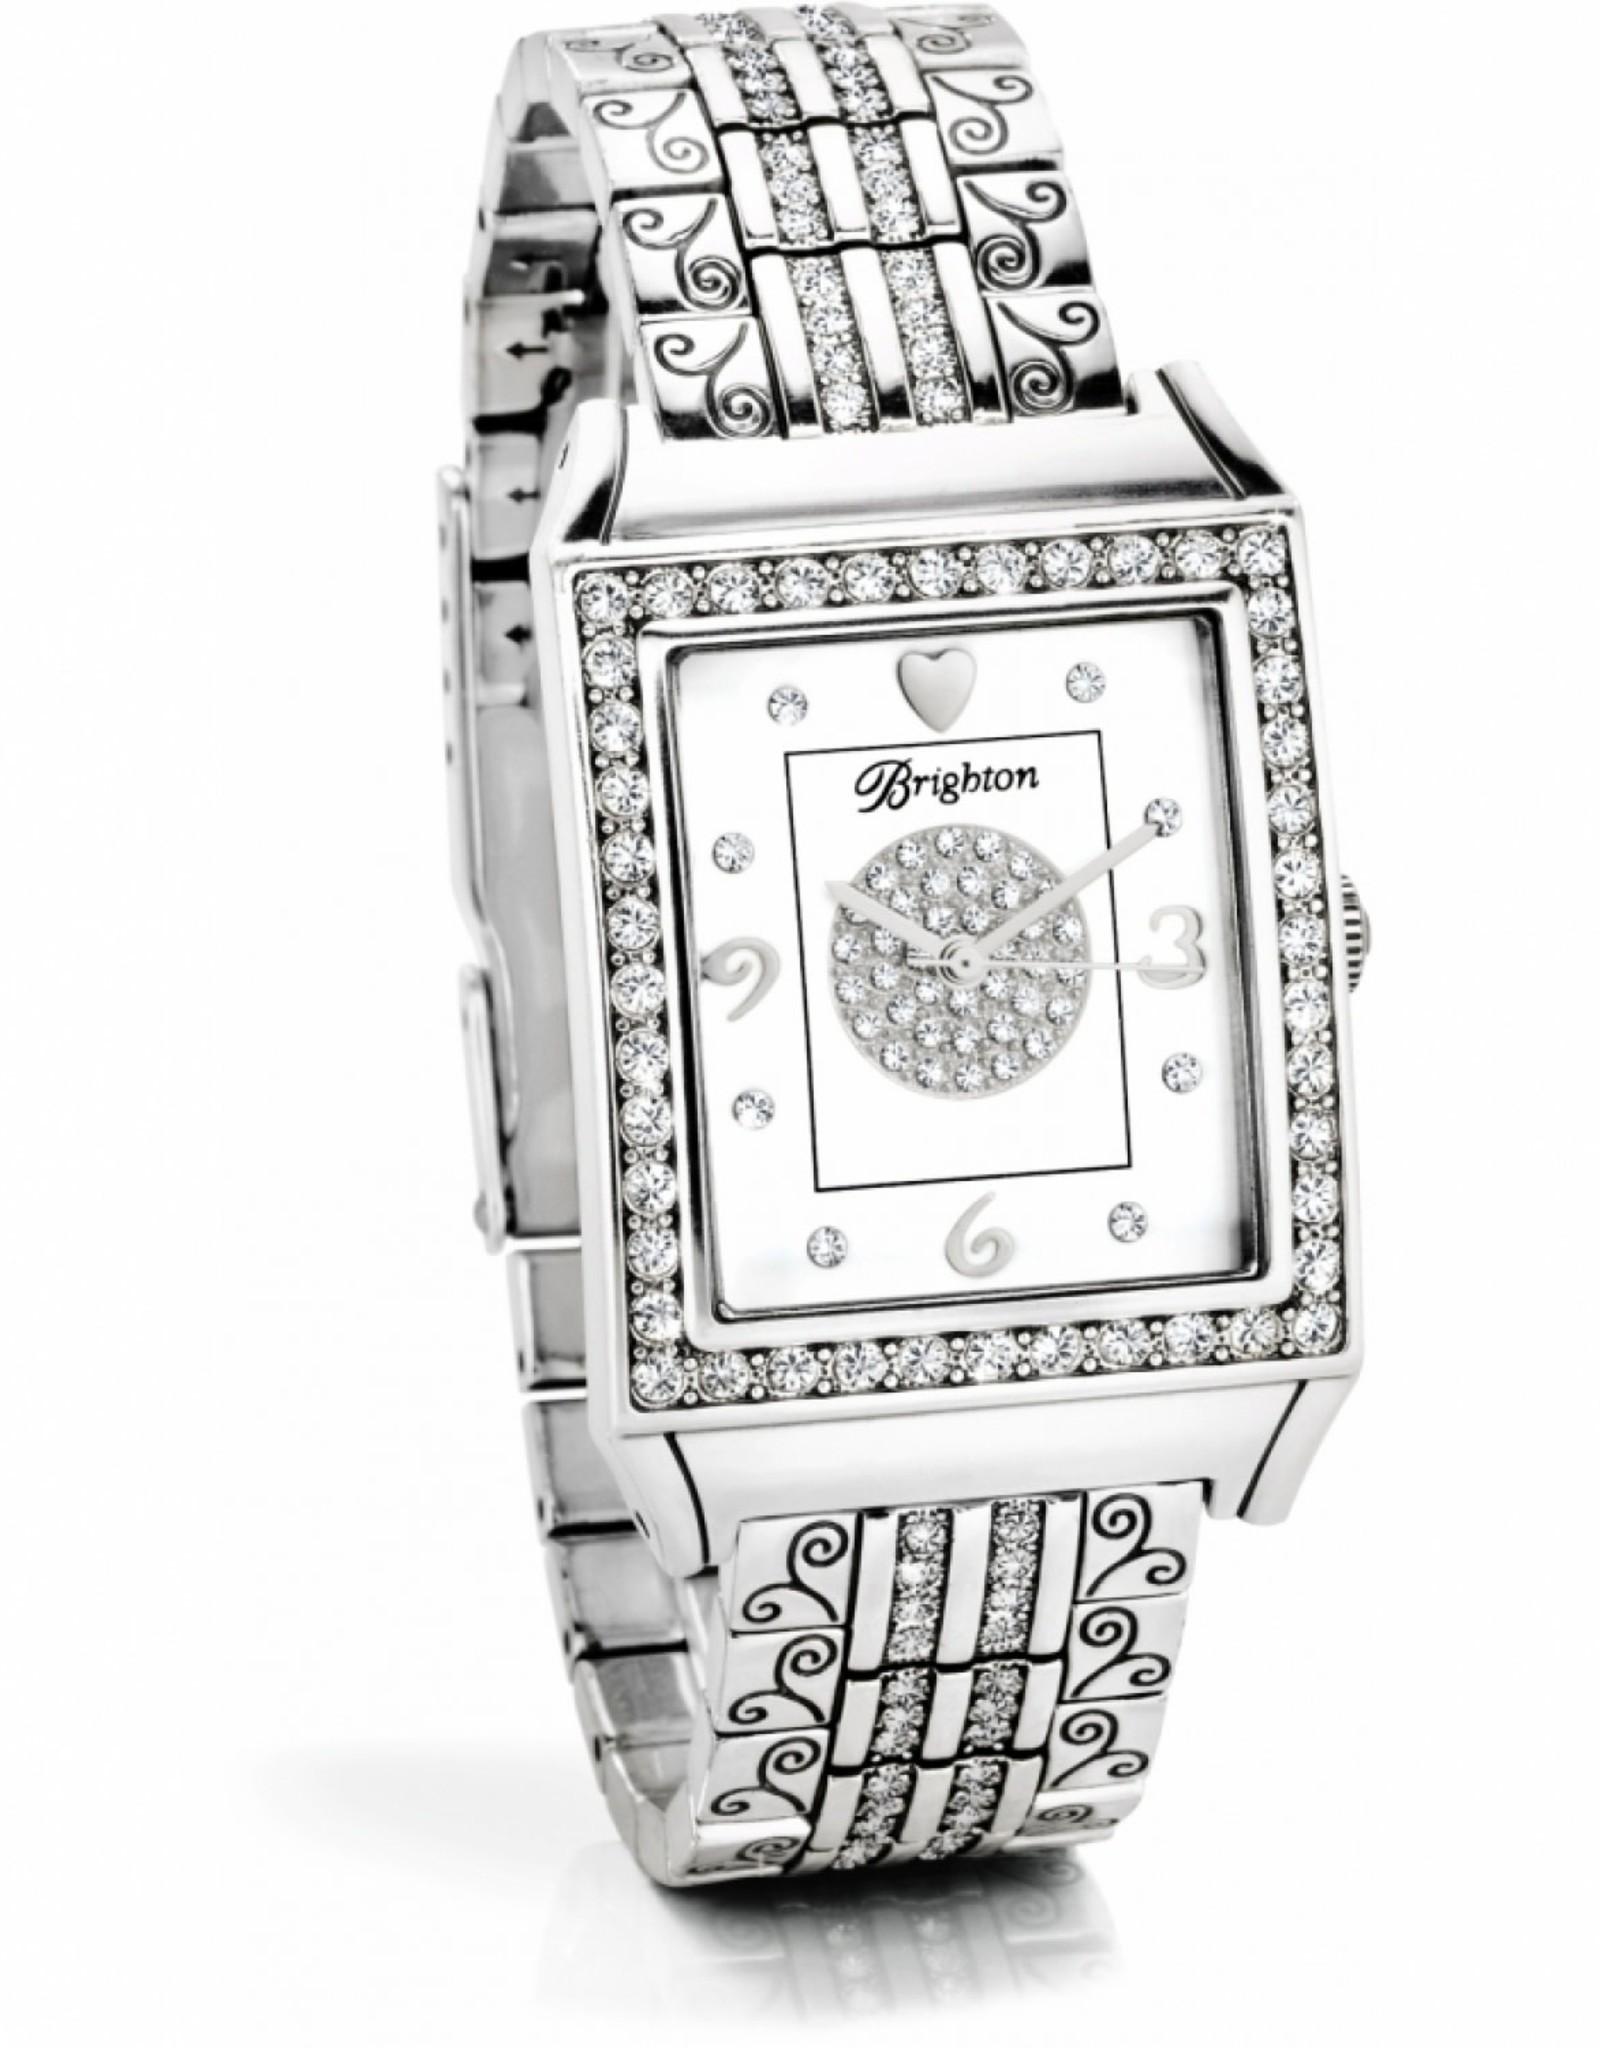 Brighton Diamond Bar Watch